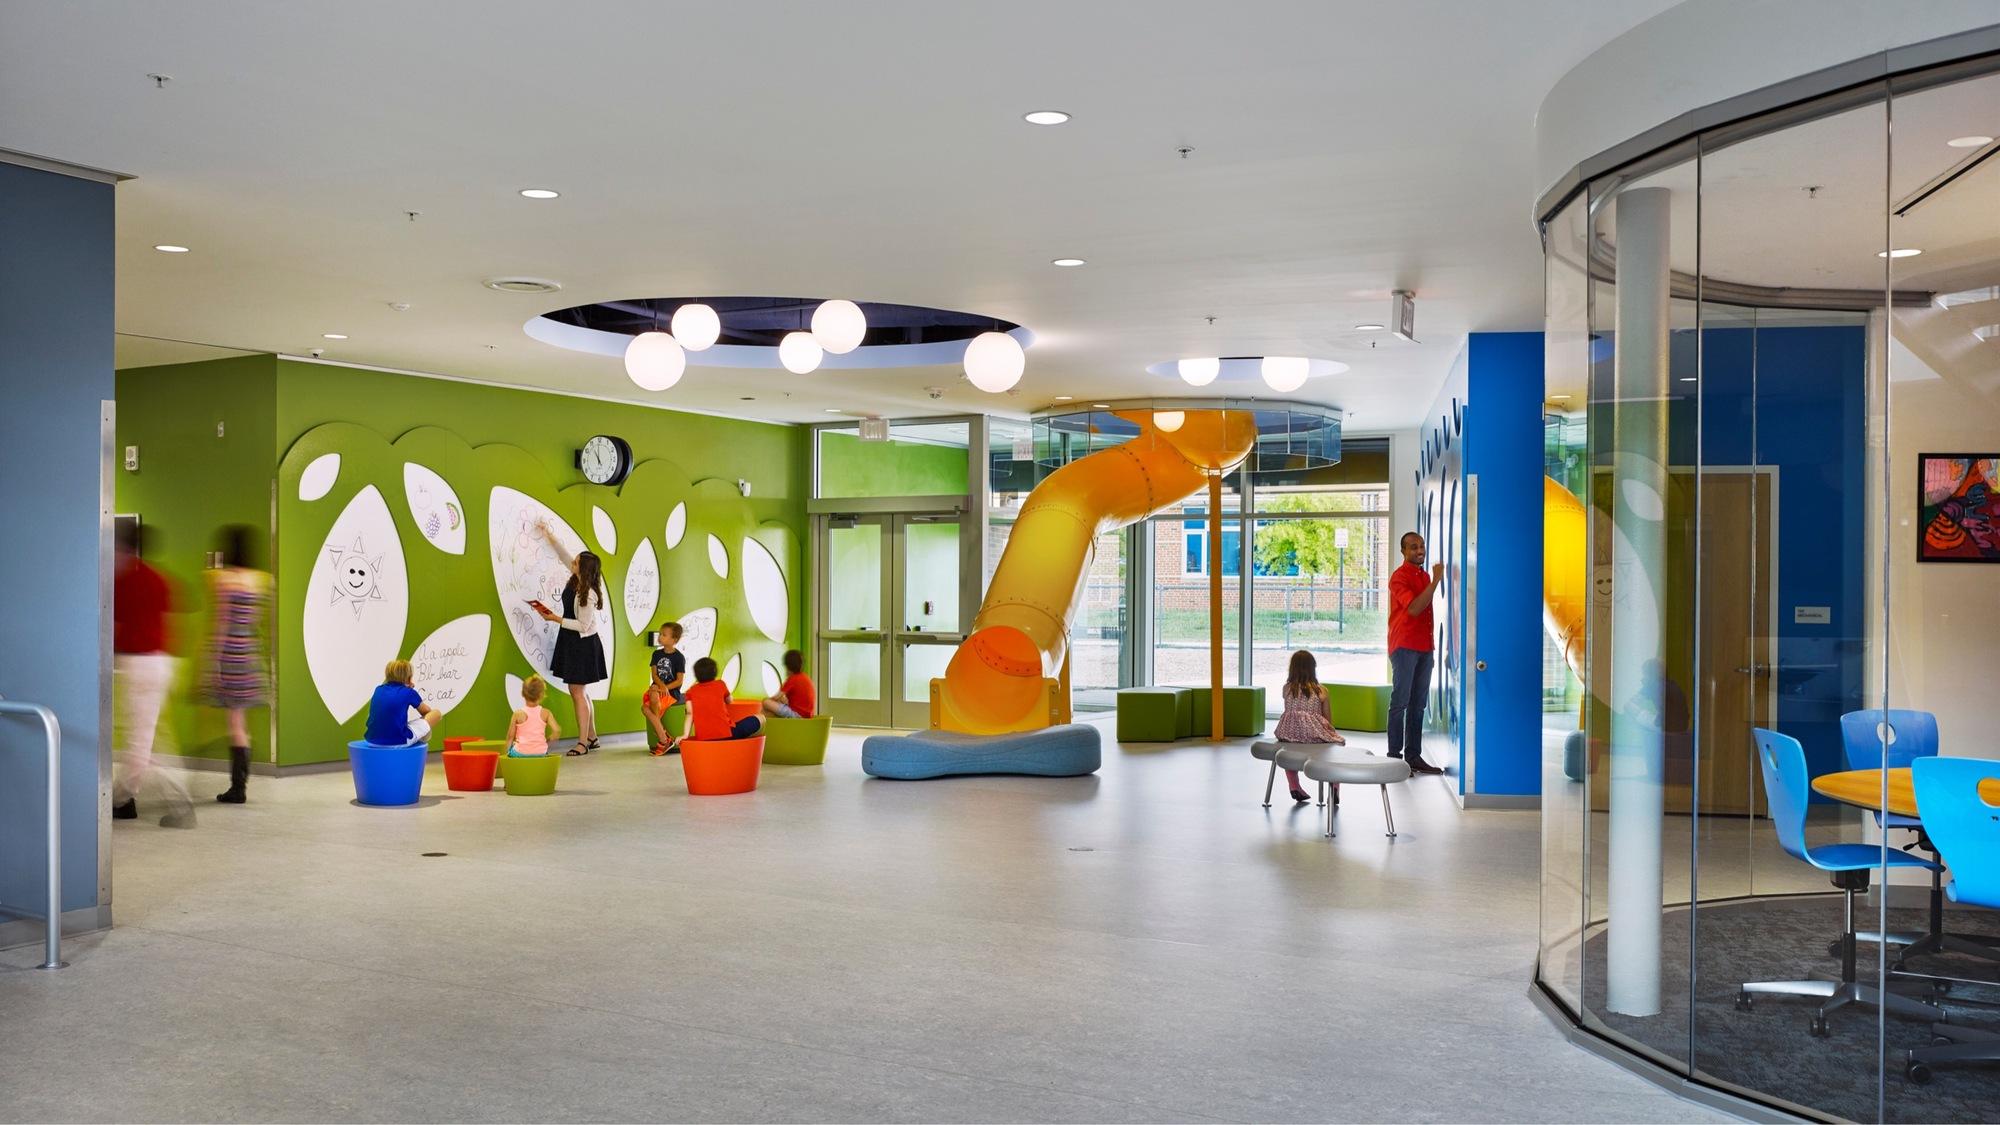 usa in exceptional ideas schools top best europe interior popular design